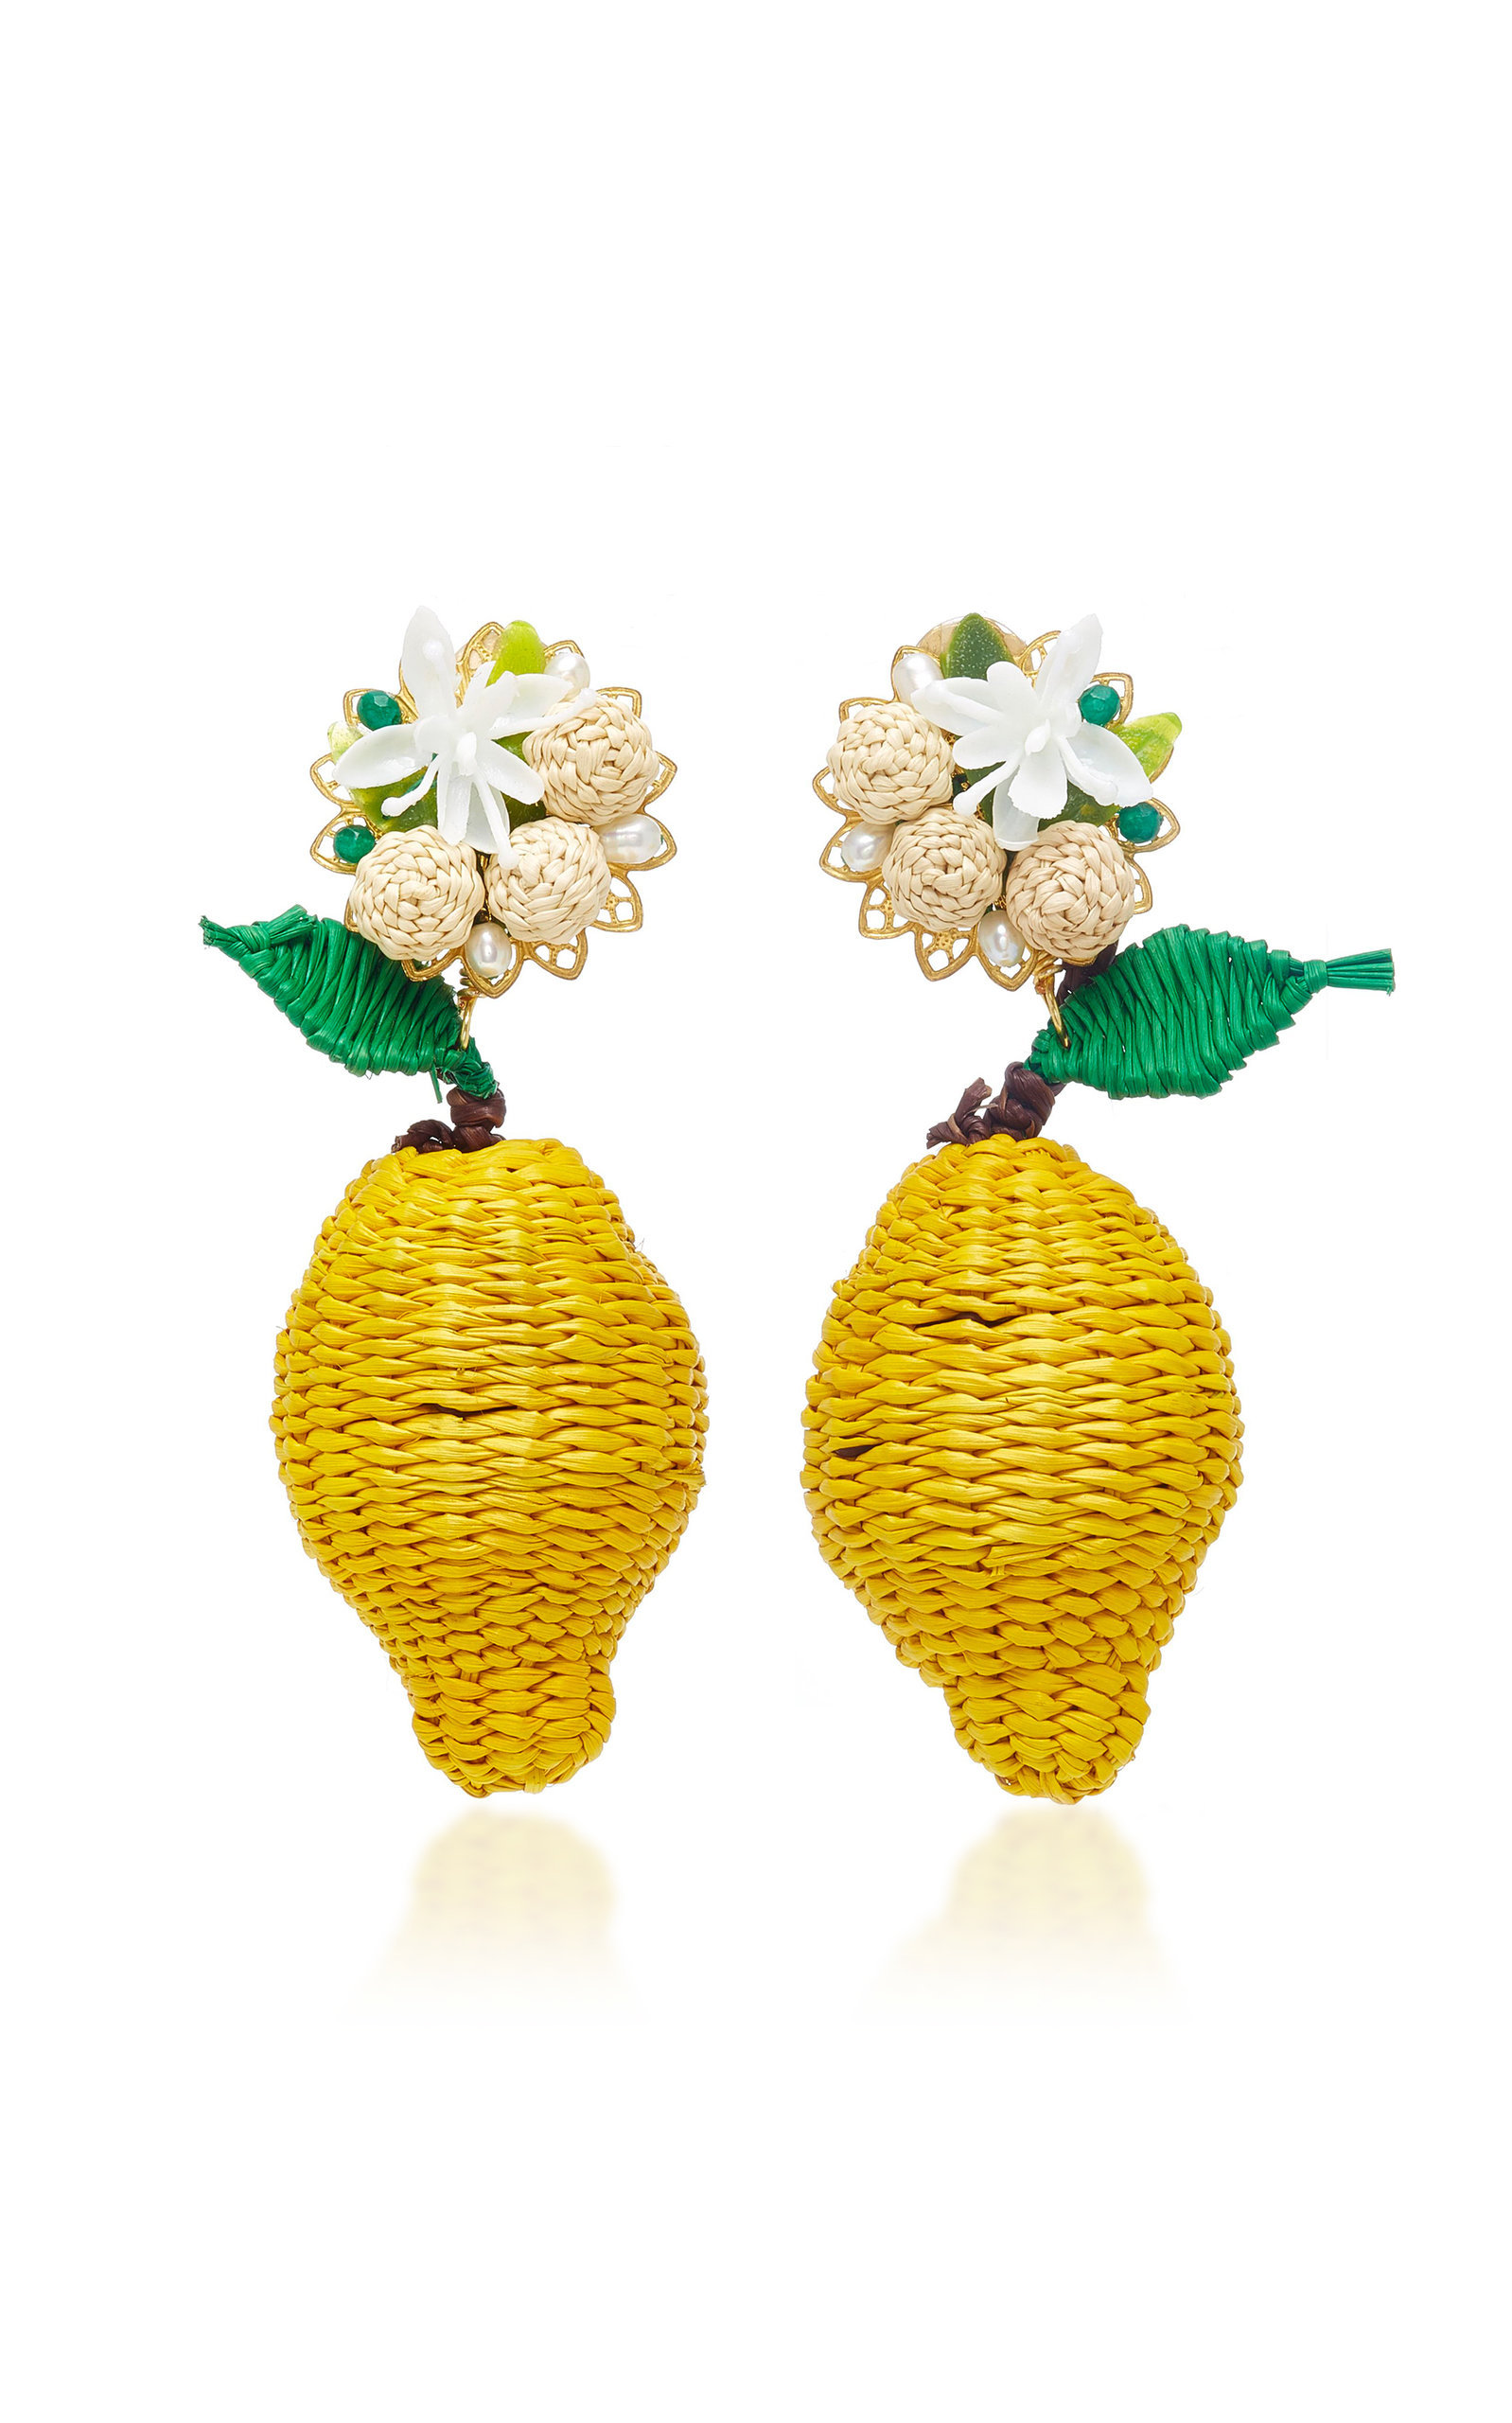 large_mercedes-salazar-yellow-limon-silvestre-earrings.jpg